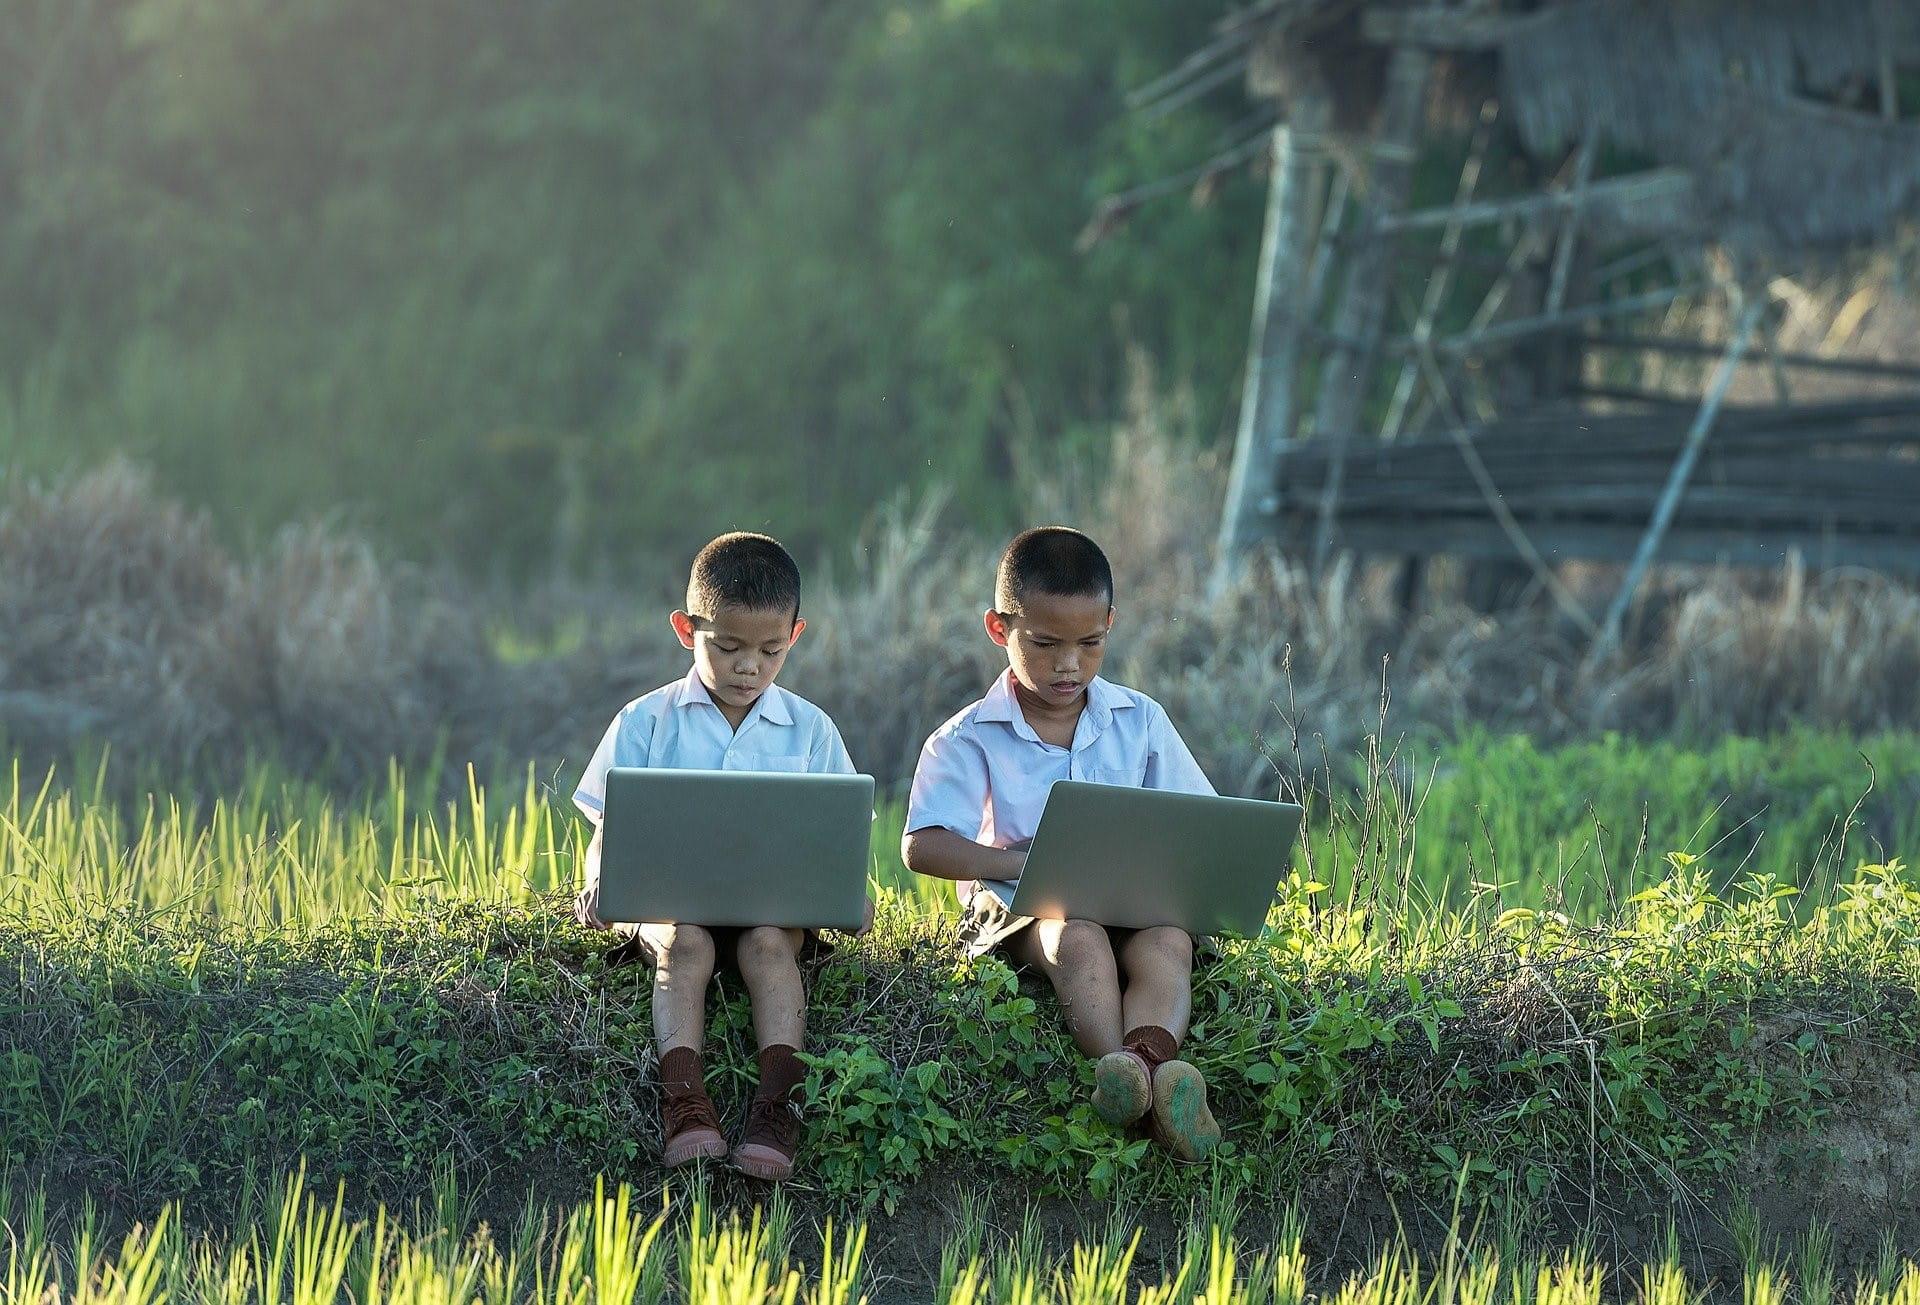 Dua anak sedang duduk di padang rumput, masing-masing dengan laptop di pangkuan mereka.